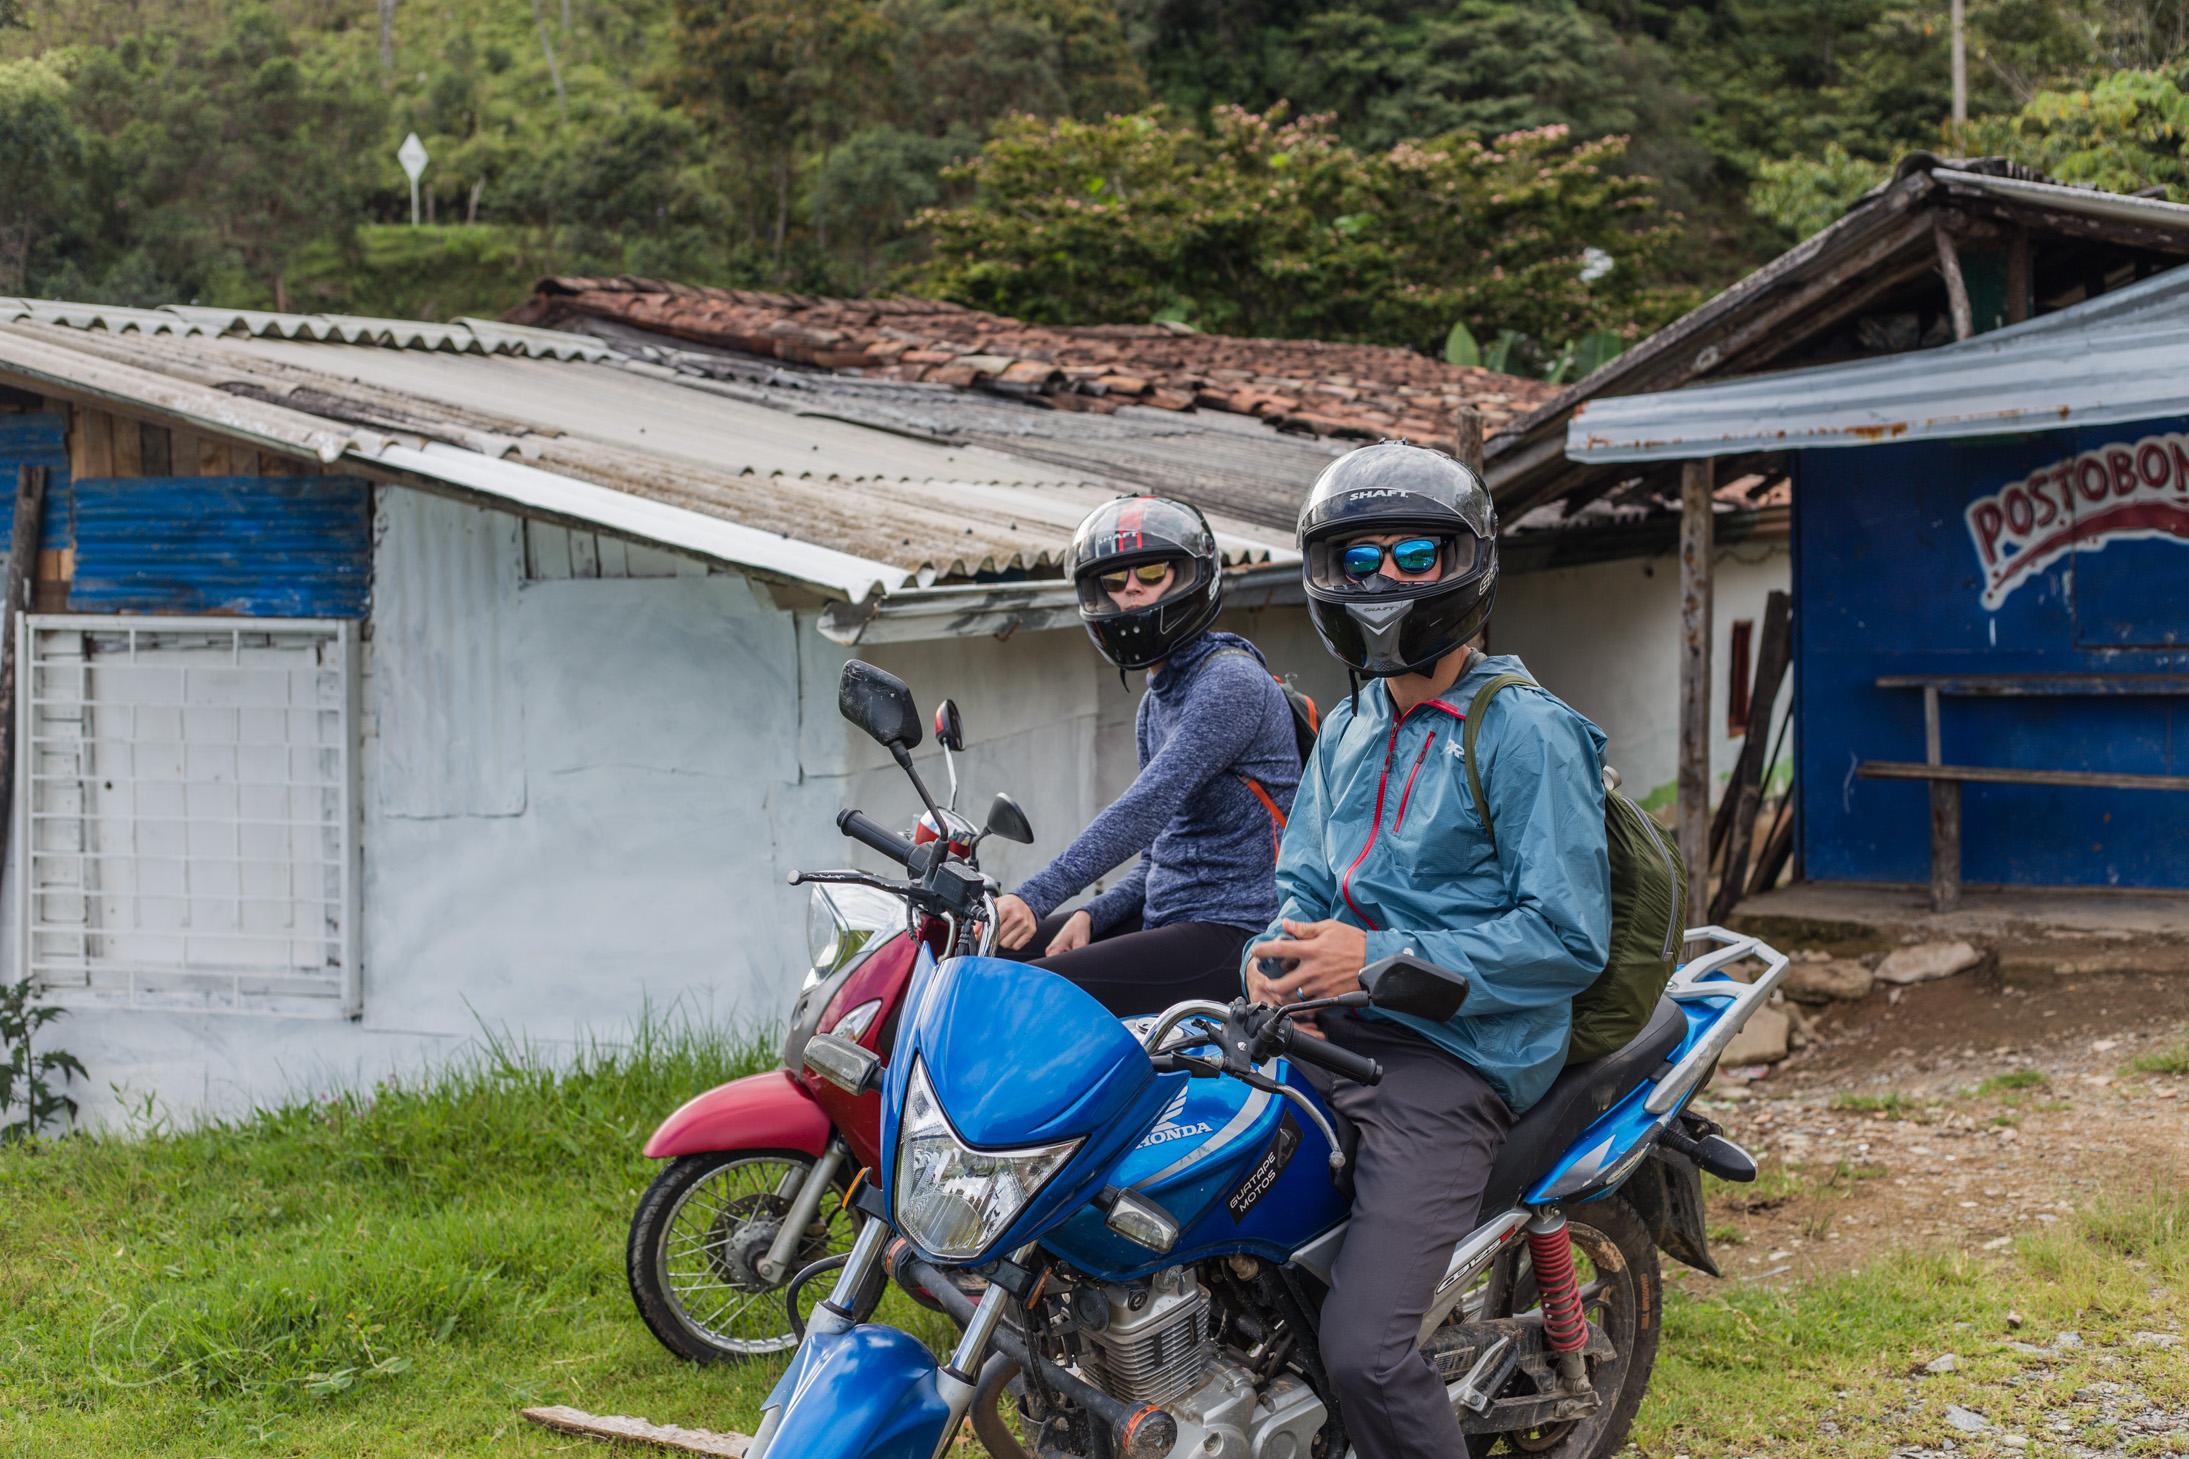 Colombia-238.jpg